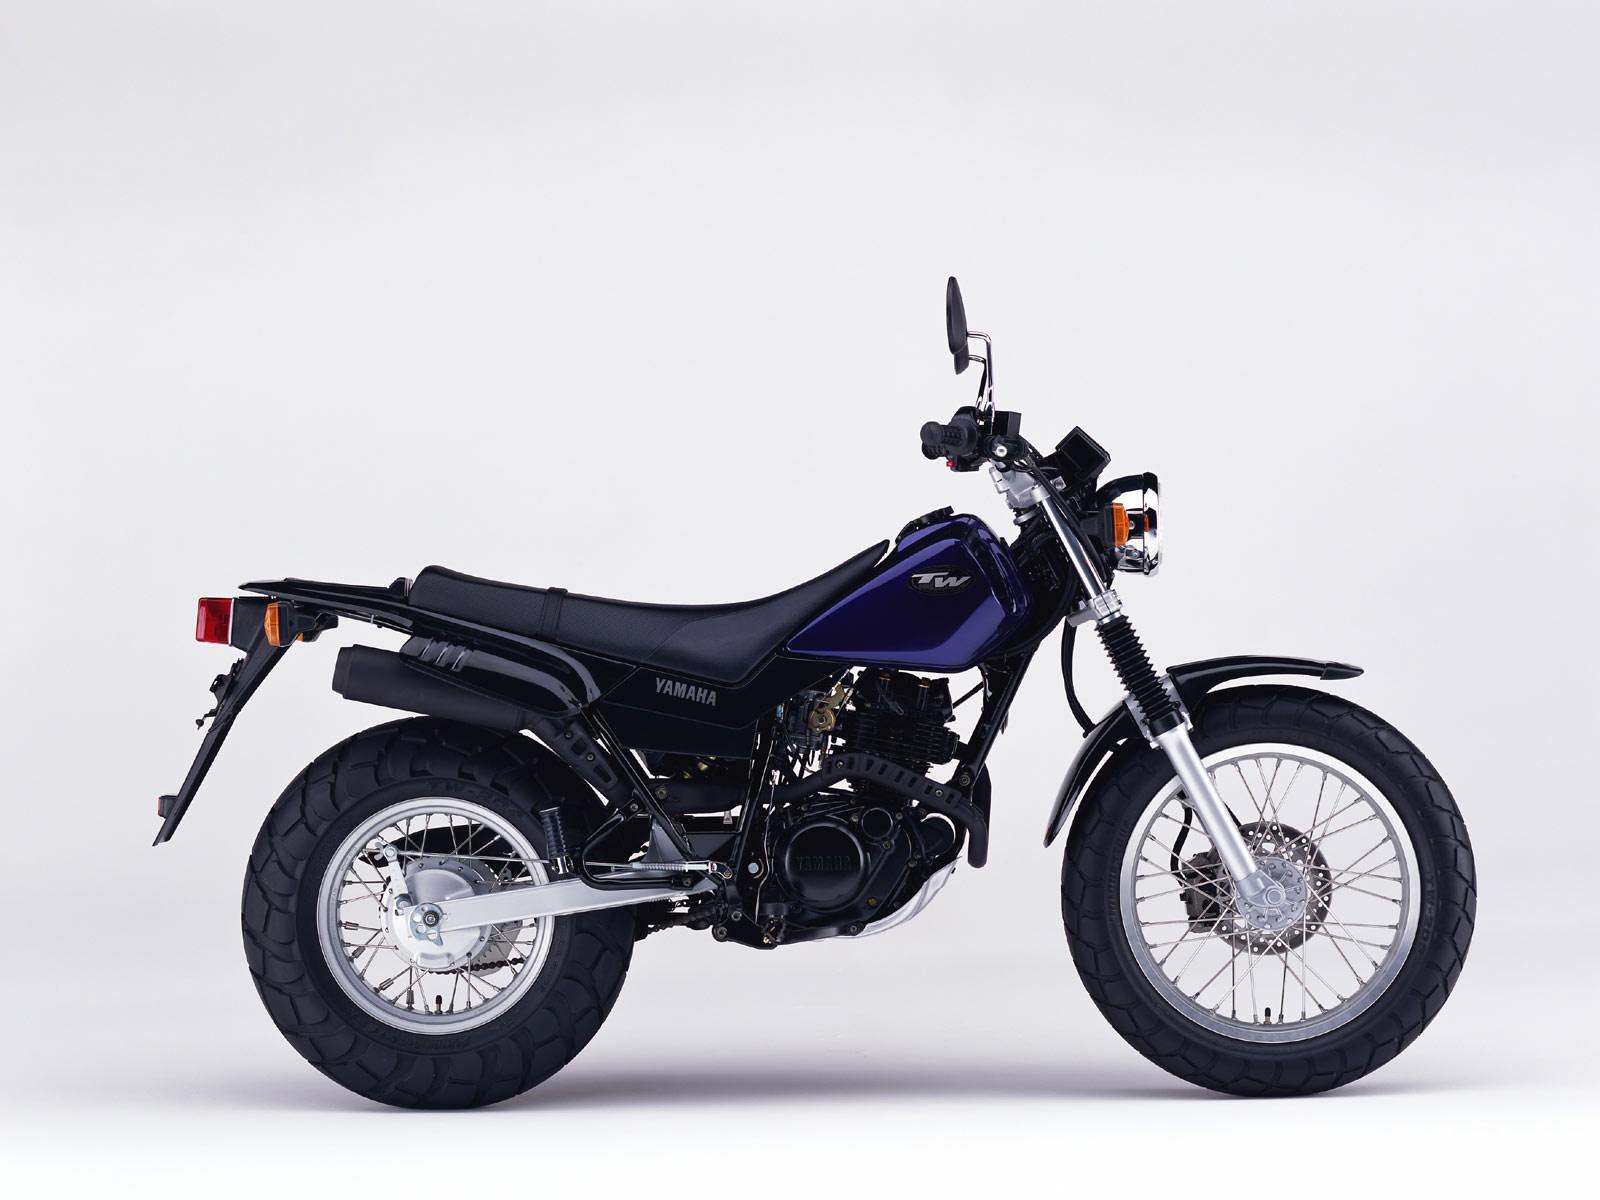 2003 Yamaha Tw 125 Motorcycle Wallpapers Accident Lawyers